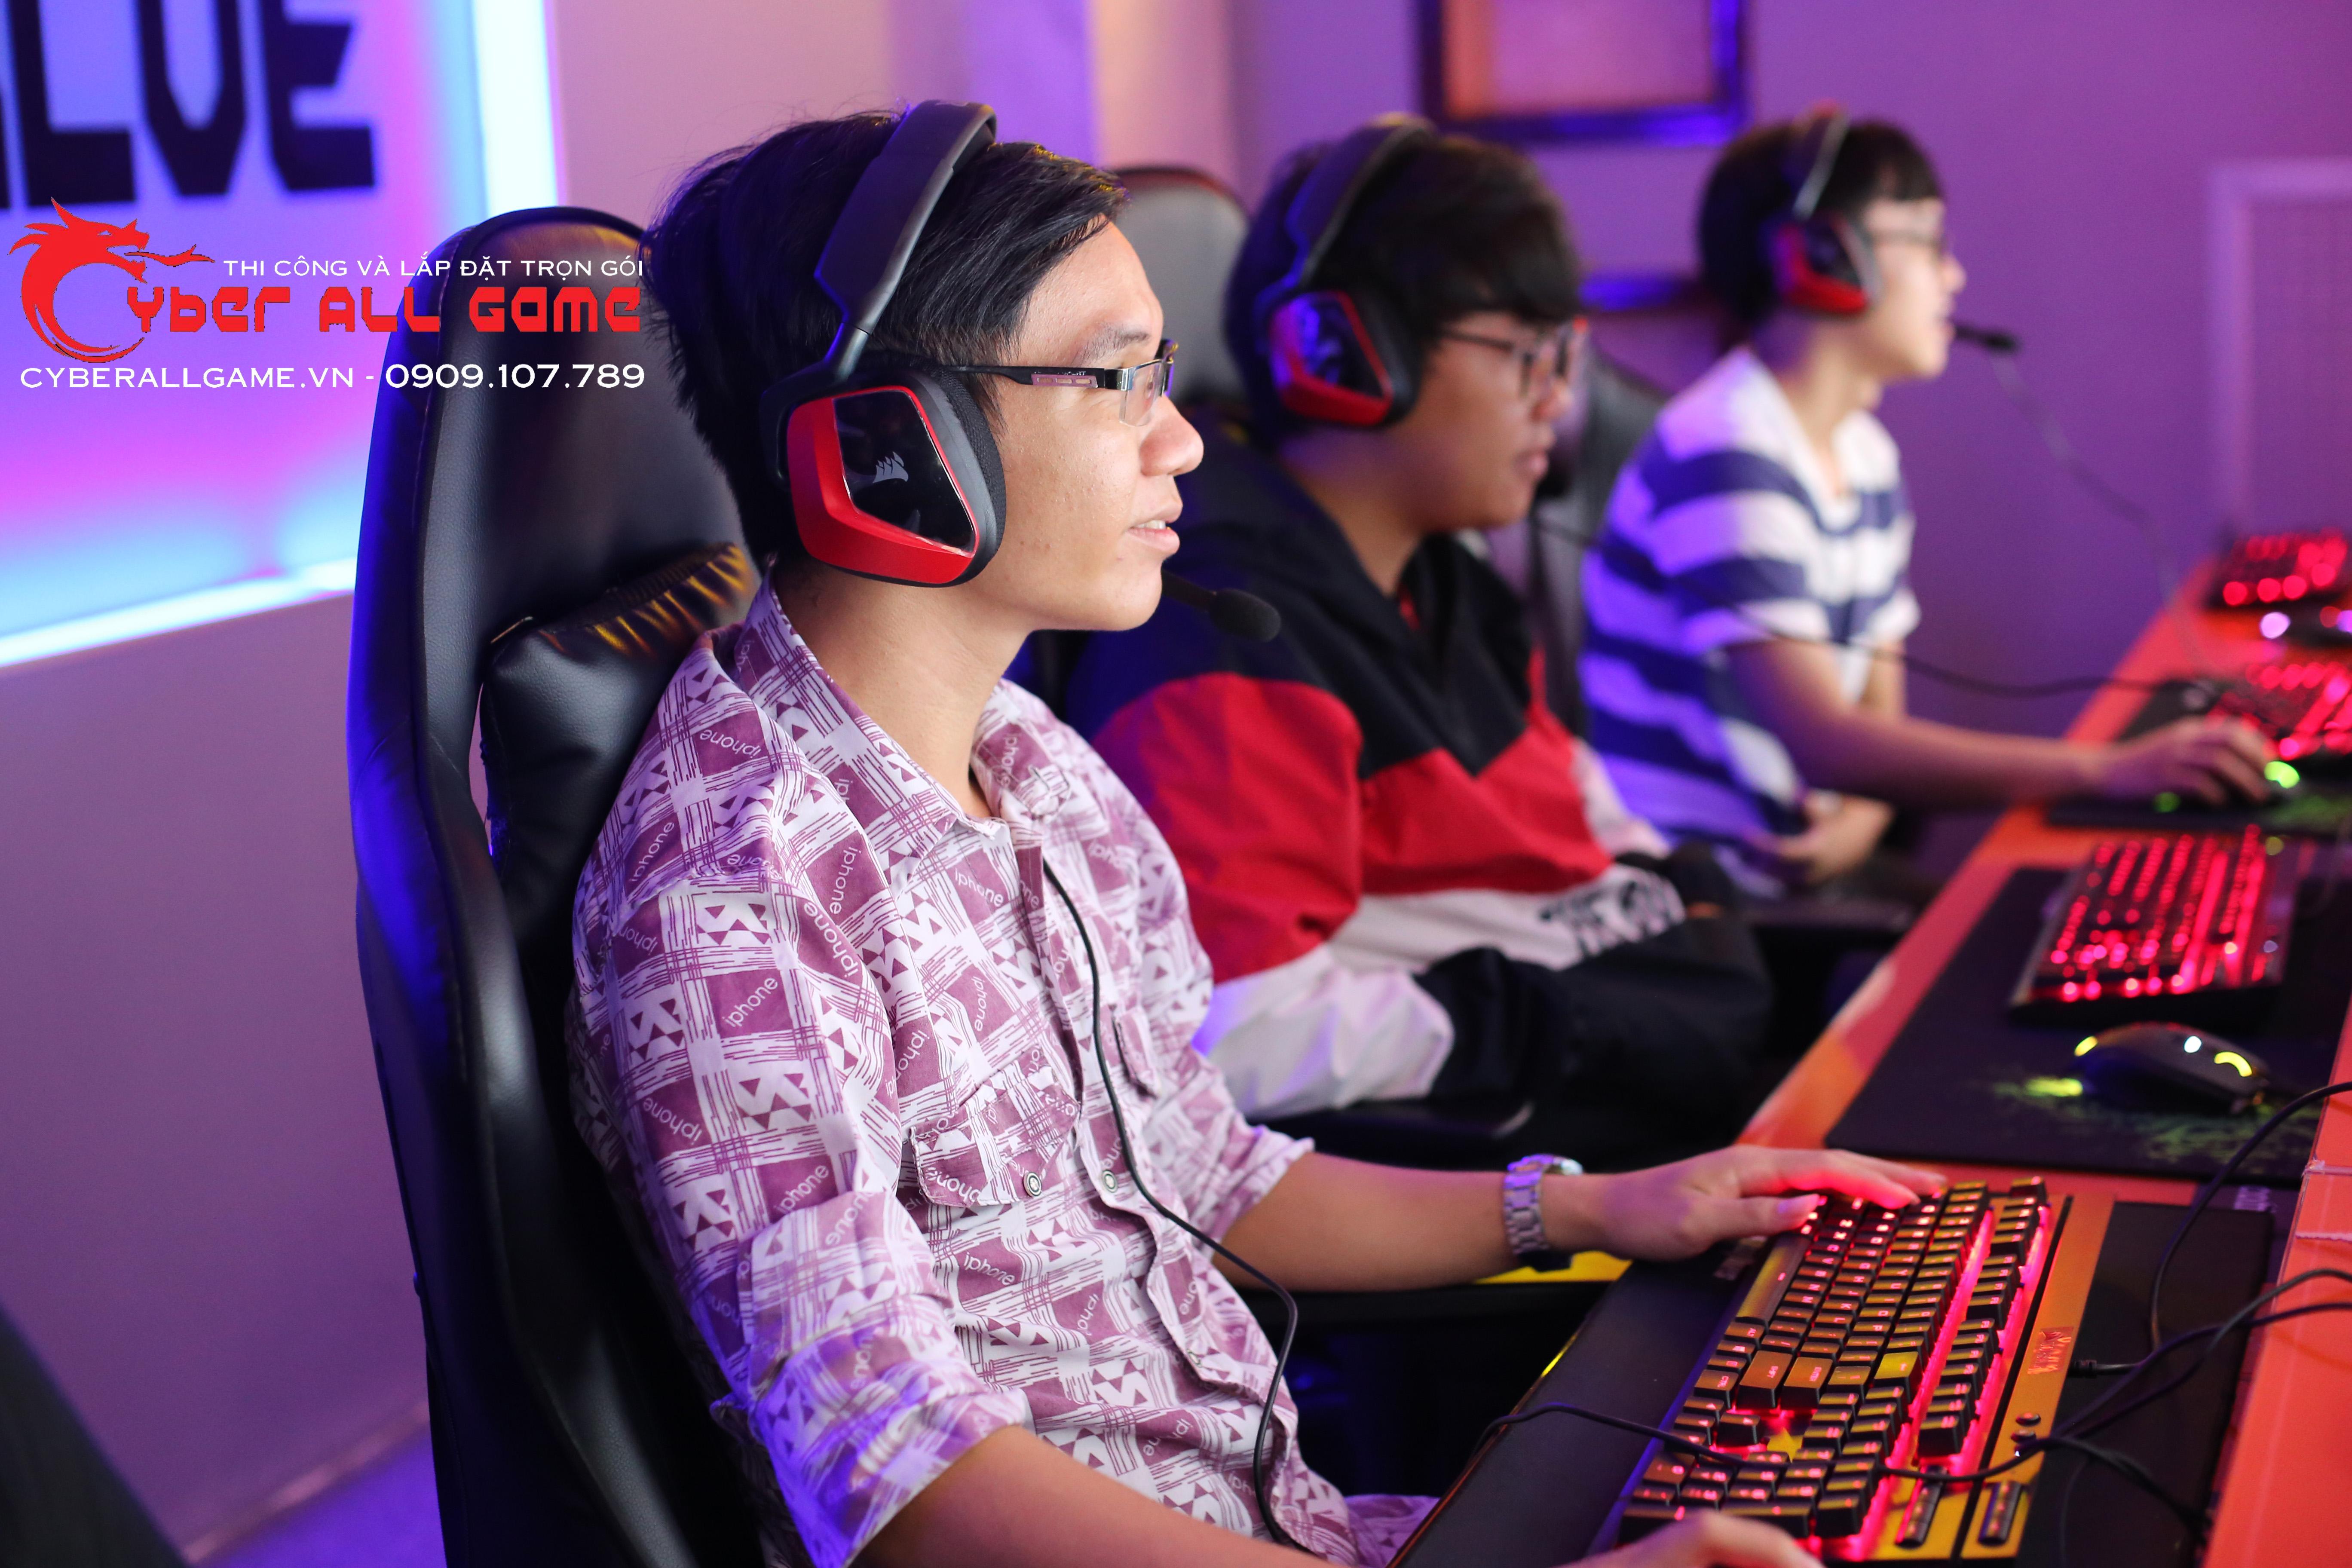 cyber game esport cao cấp